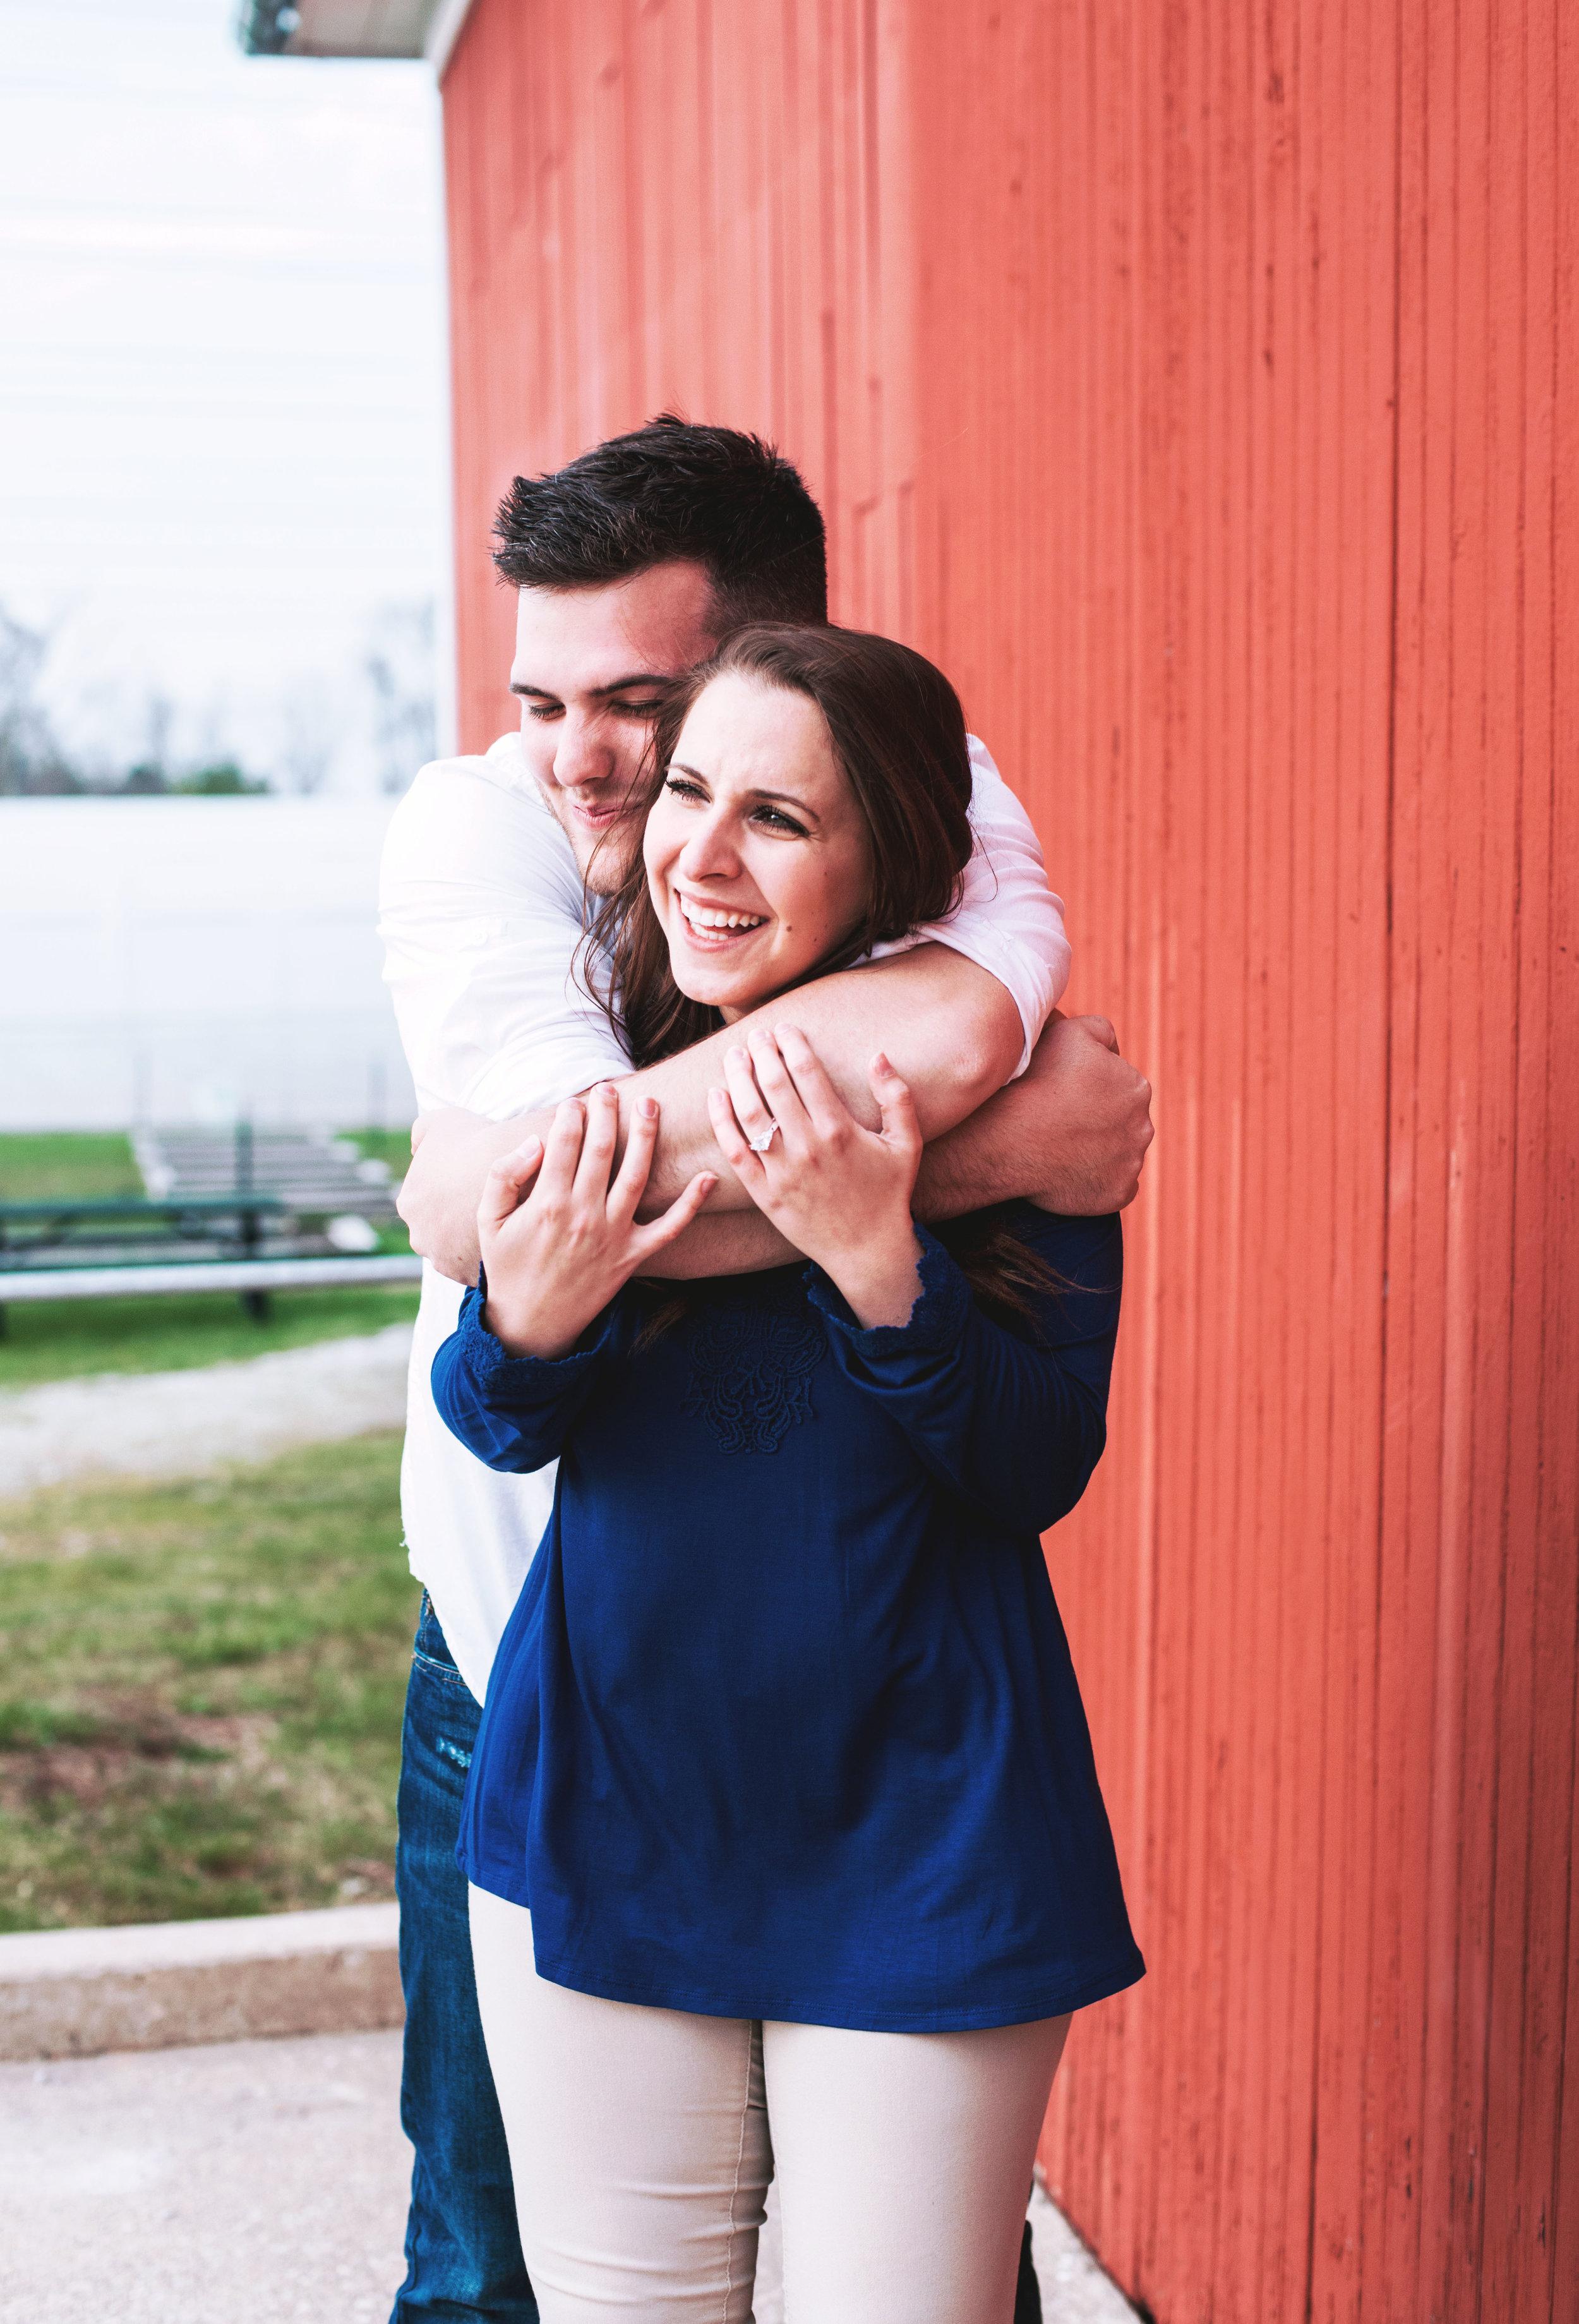 Clayton&Gina_Engagement-5.jpg